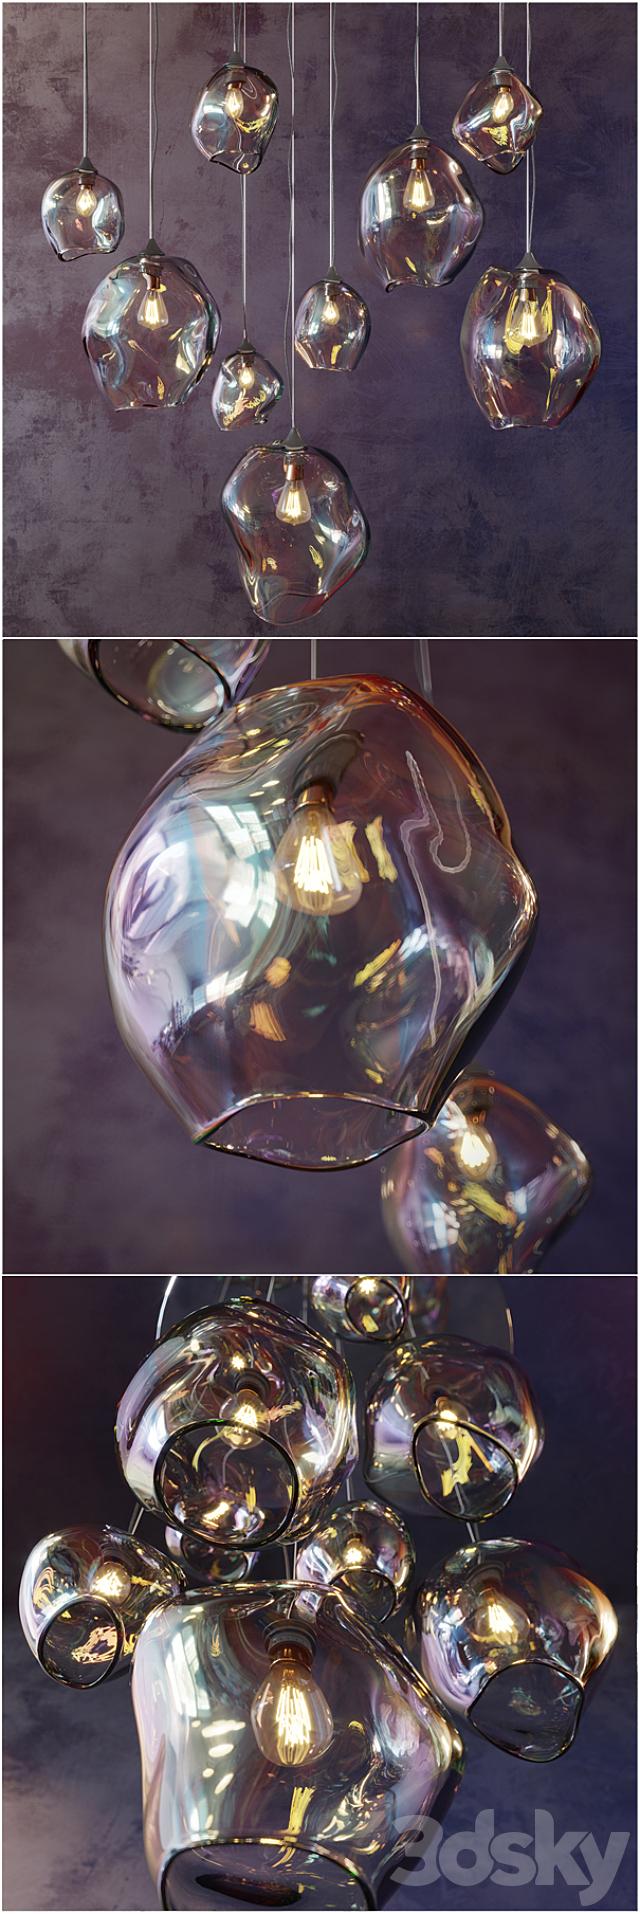 INFINITY PENDANT / INFINITY CLUSTER by John Pomp